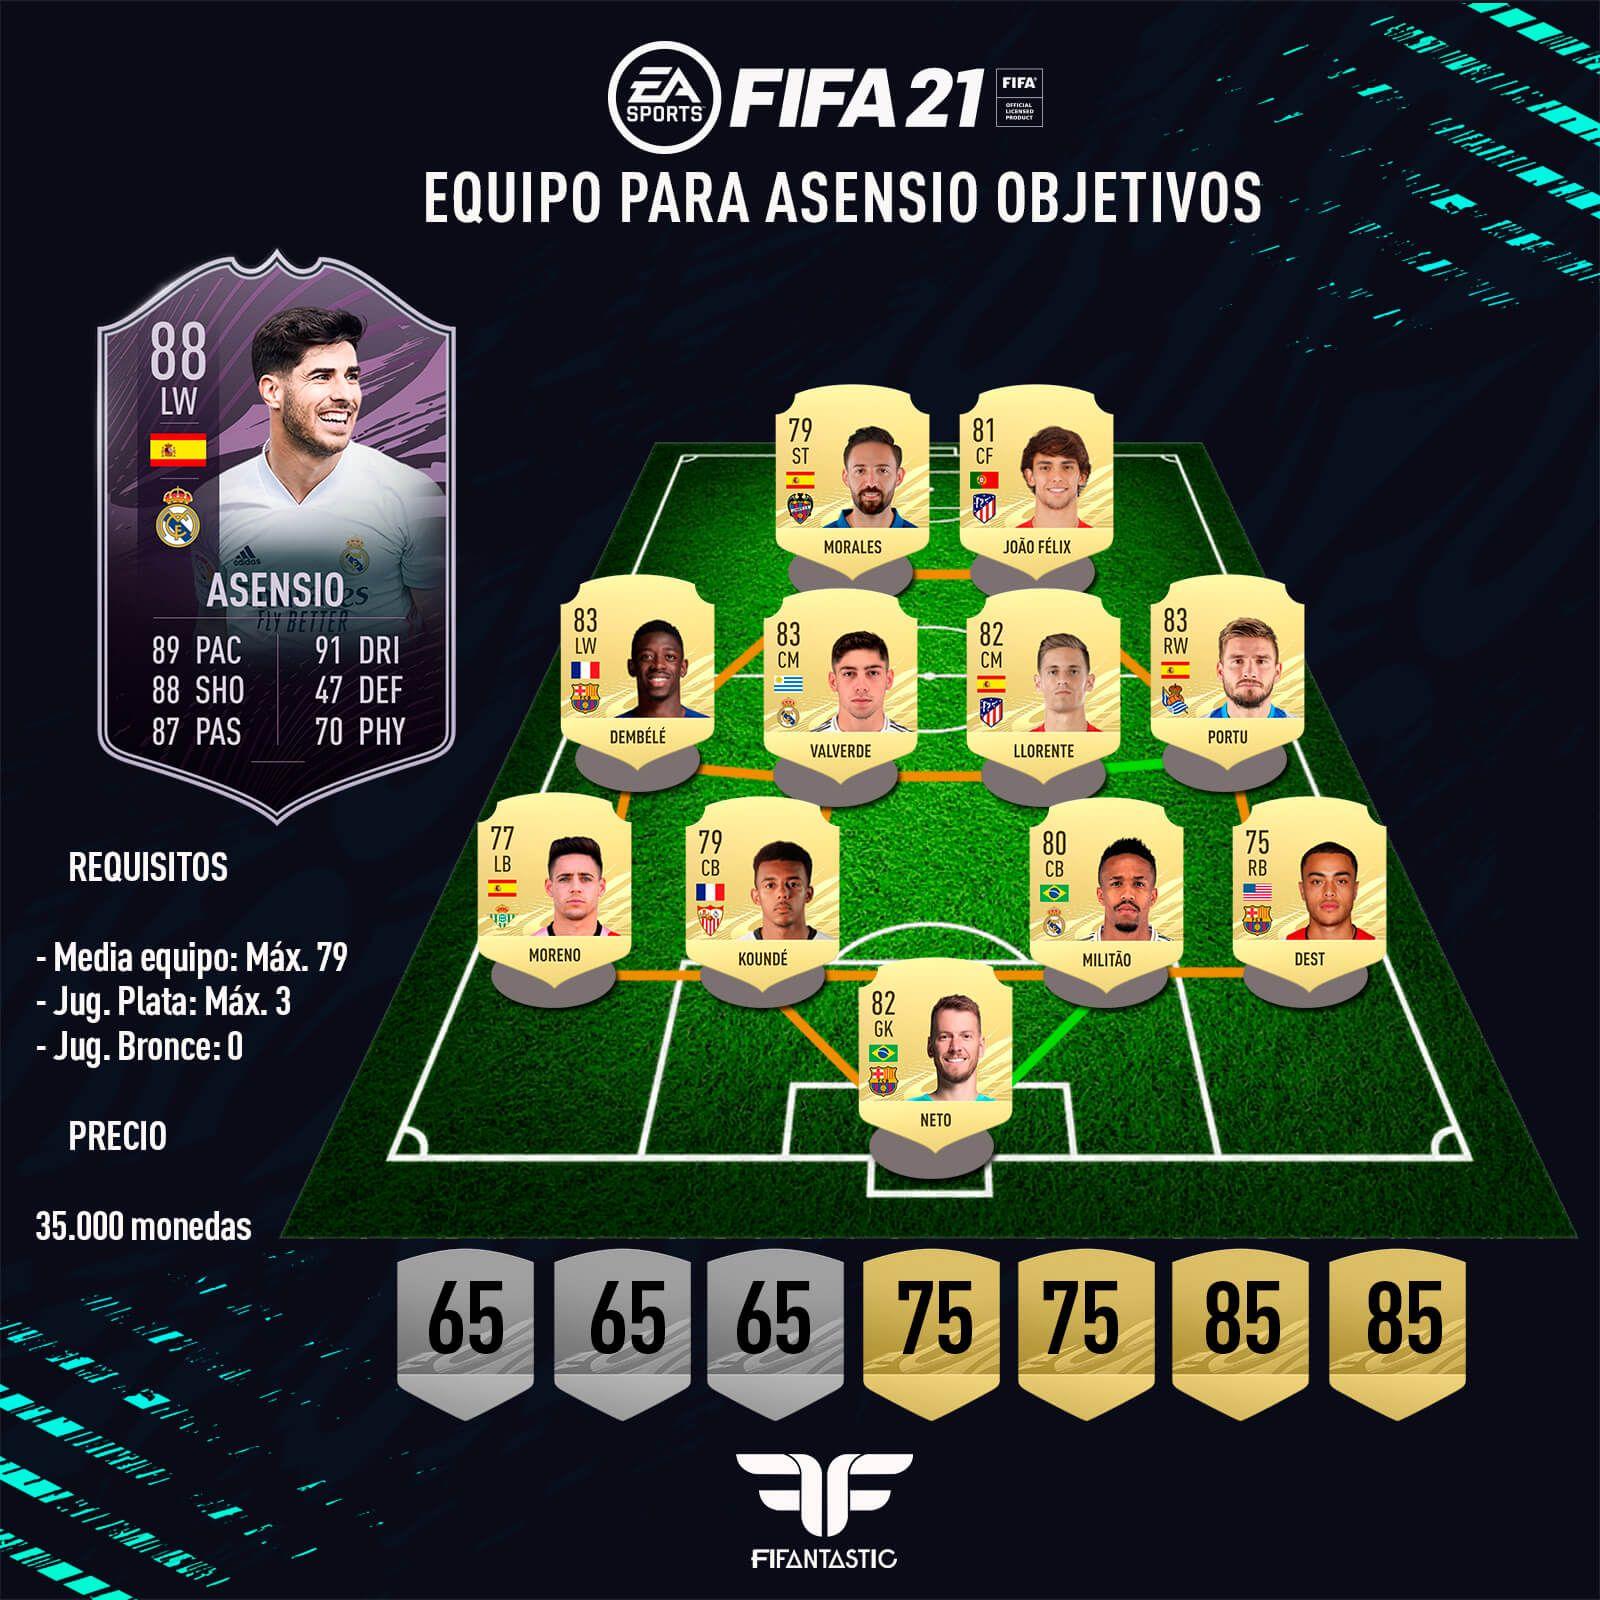 Equipo para conseguir a Marco Asensio Objetivos en FIFA 21 Ultimate Team